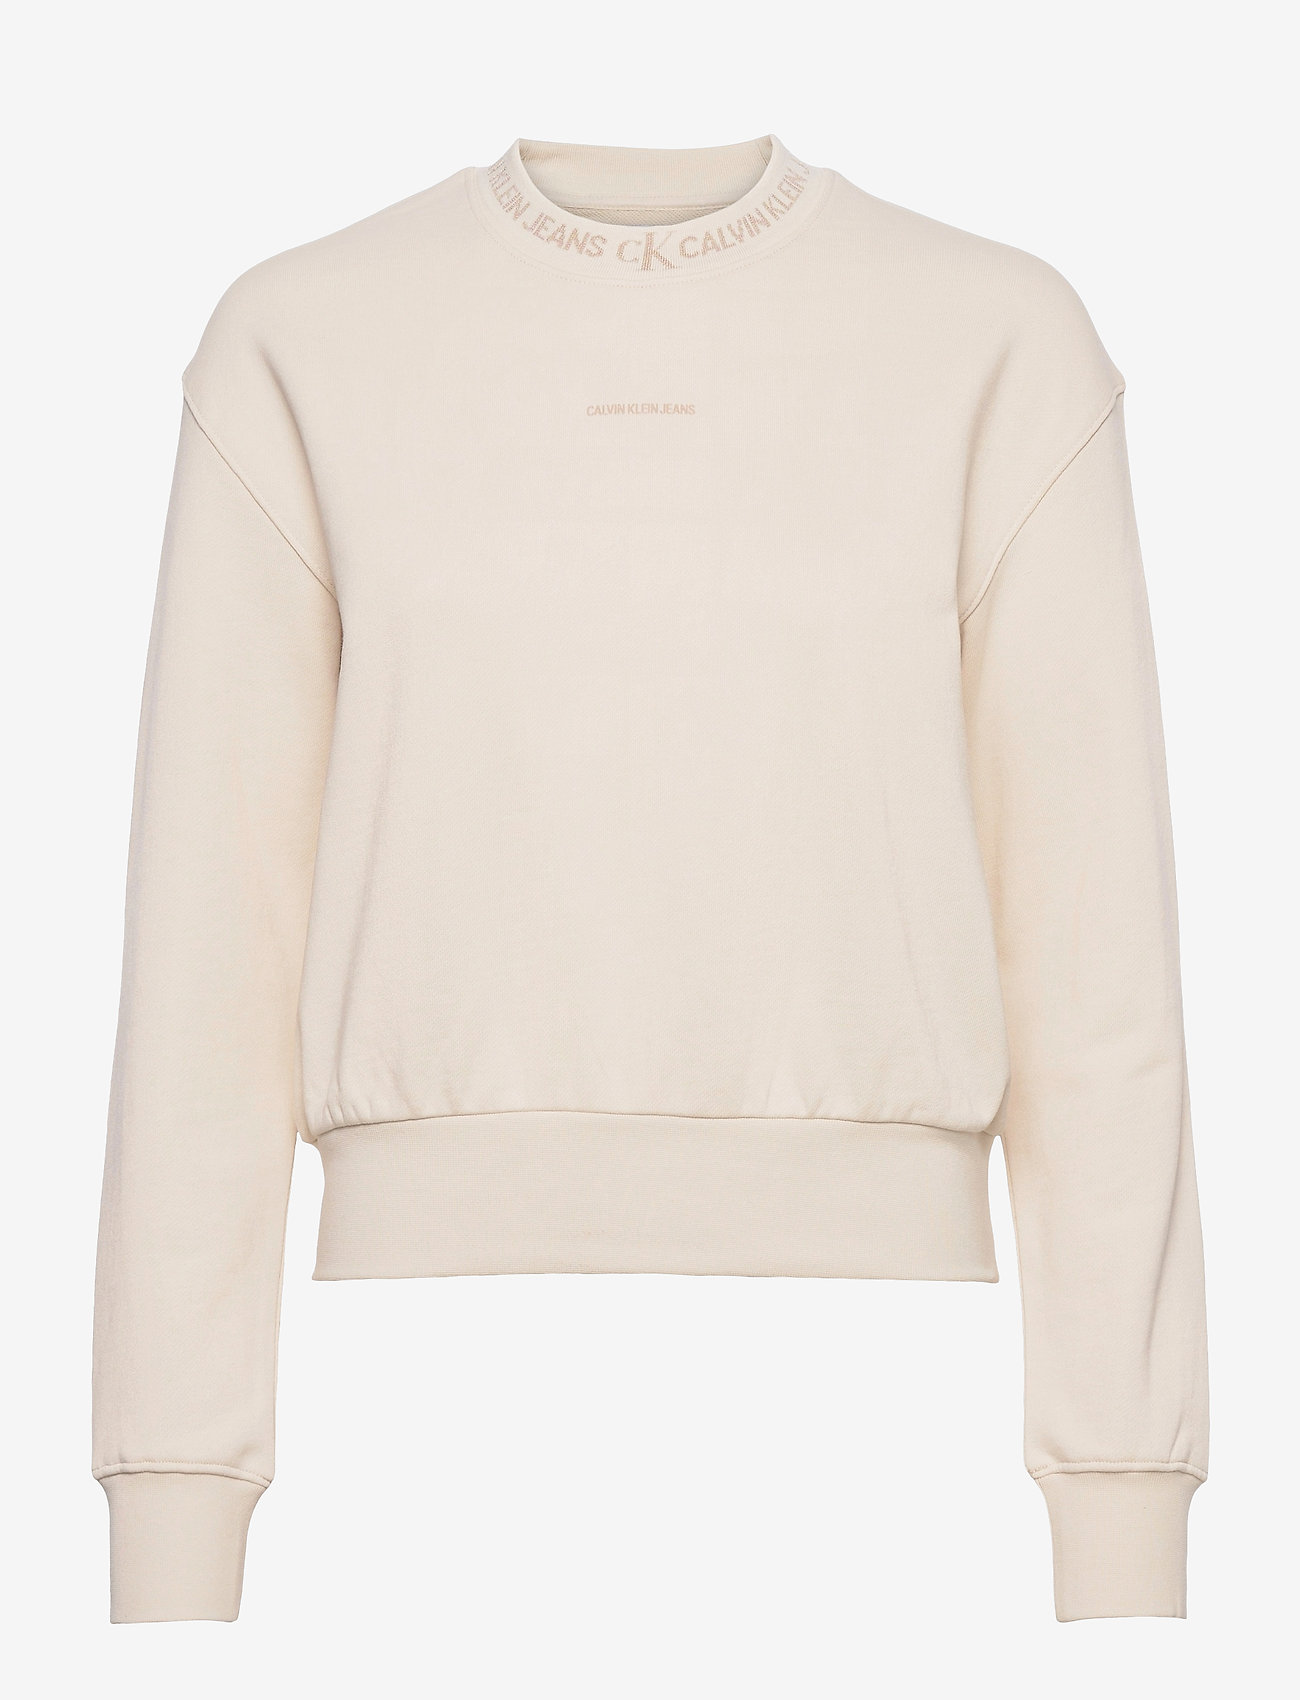 Calvin Klein Jeans - LOGO TRIM CREW NECK SWEATSHIRT - gensere og hettegensere - white sand - 0